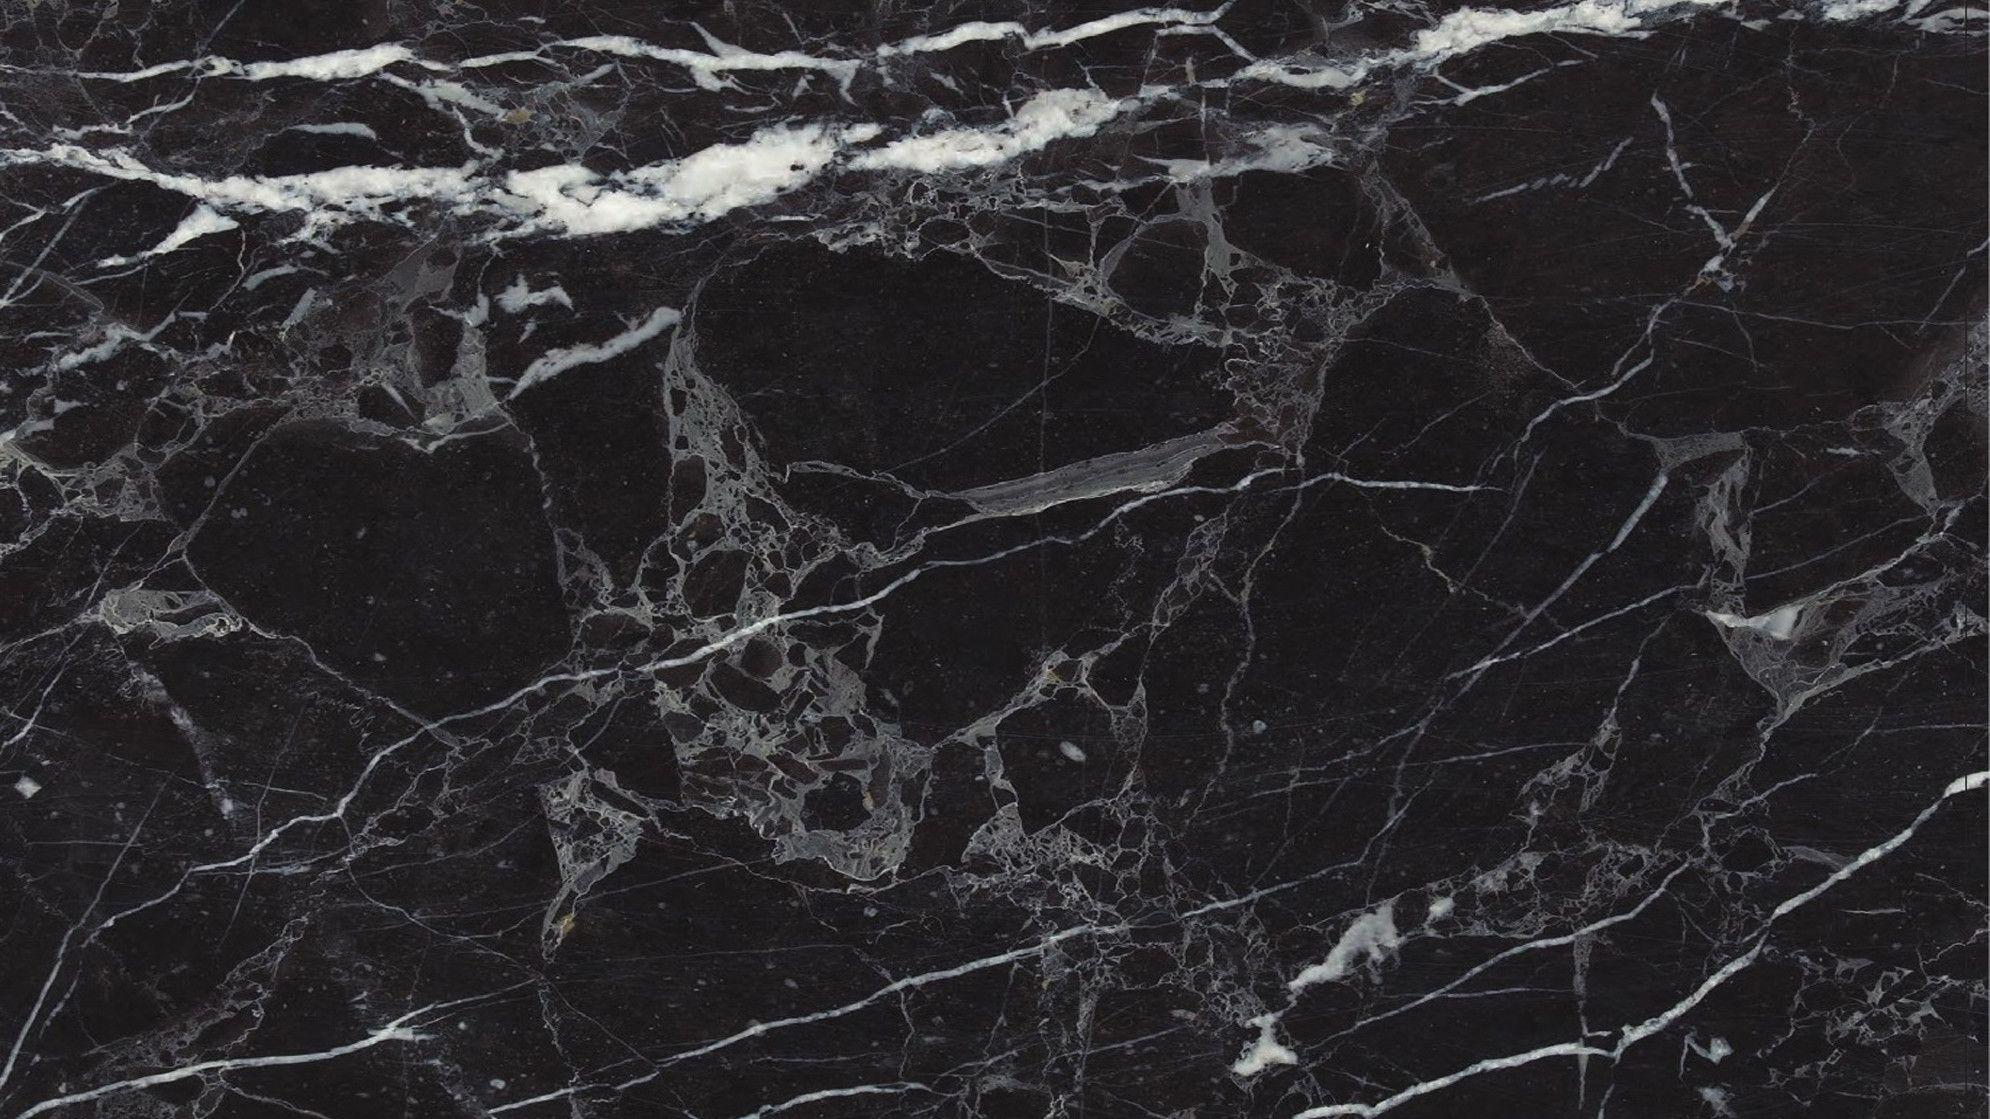 Vertical Black And Grey Desktop Wallpaper 1990x1119 Laptop Black Aesthetic Wallpaper Marble Desktop Wallpaper Black Marble Background